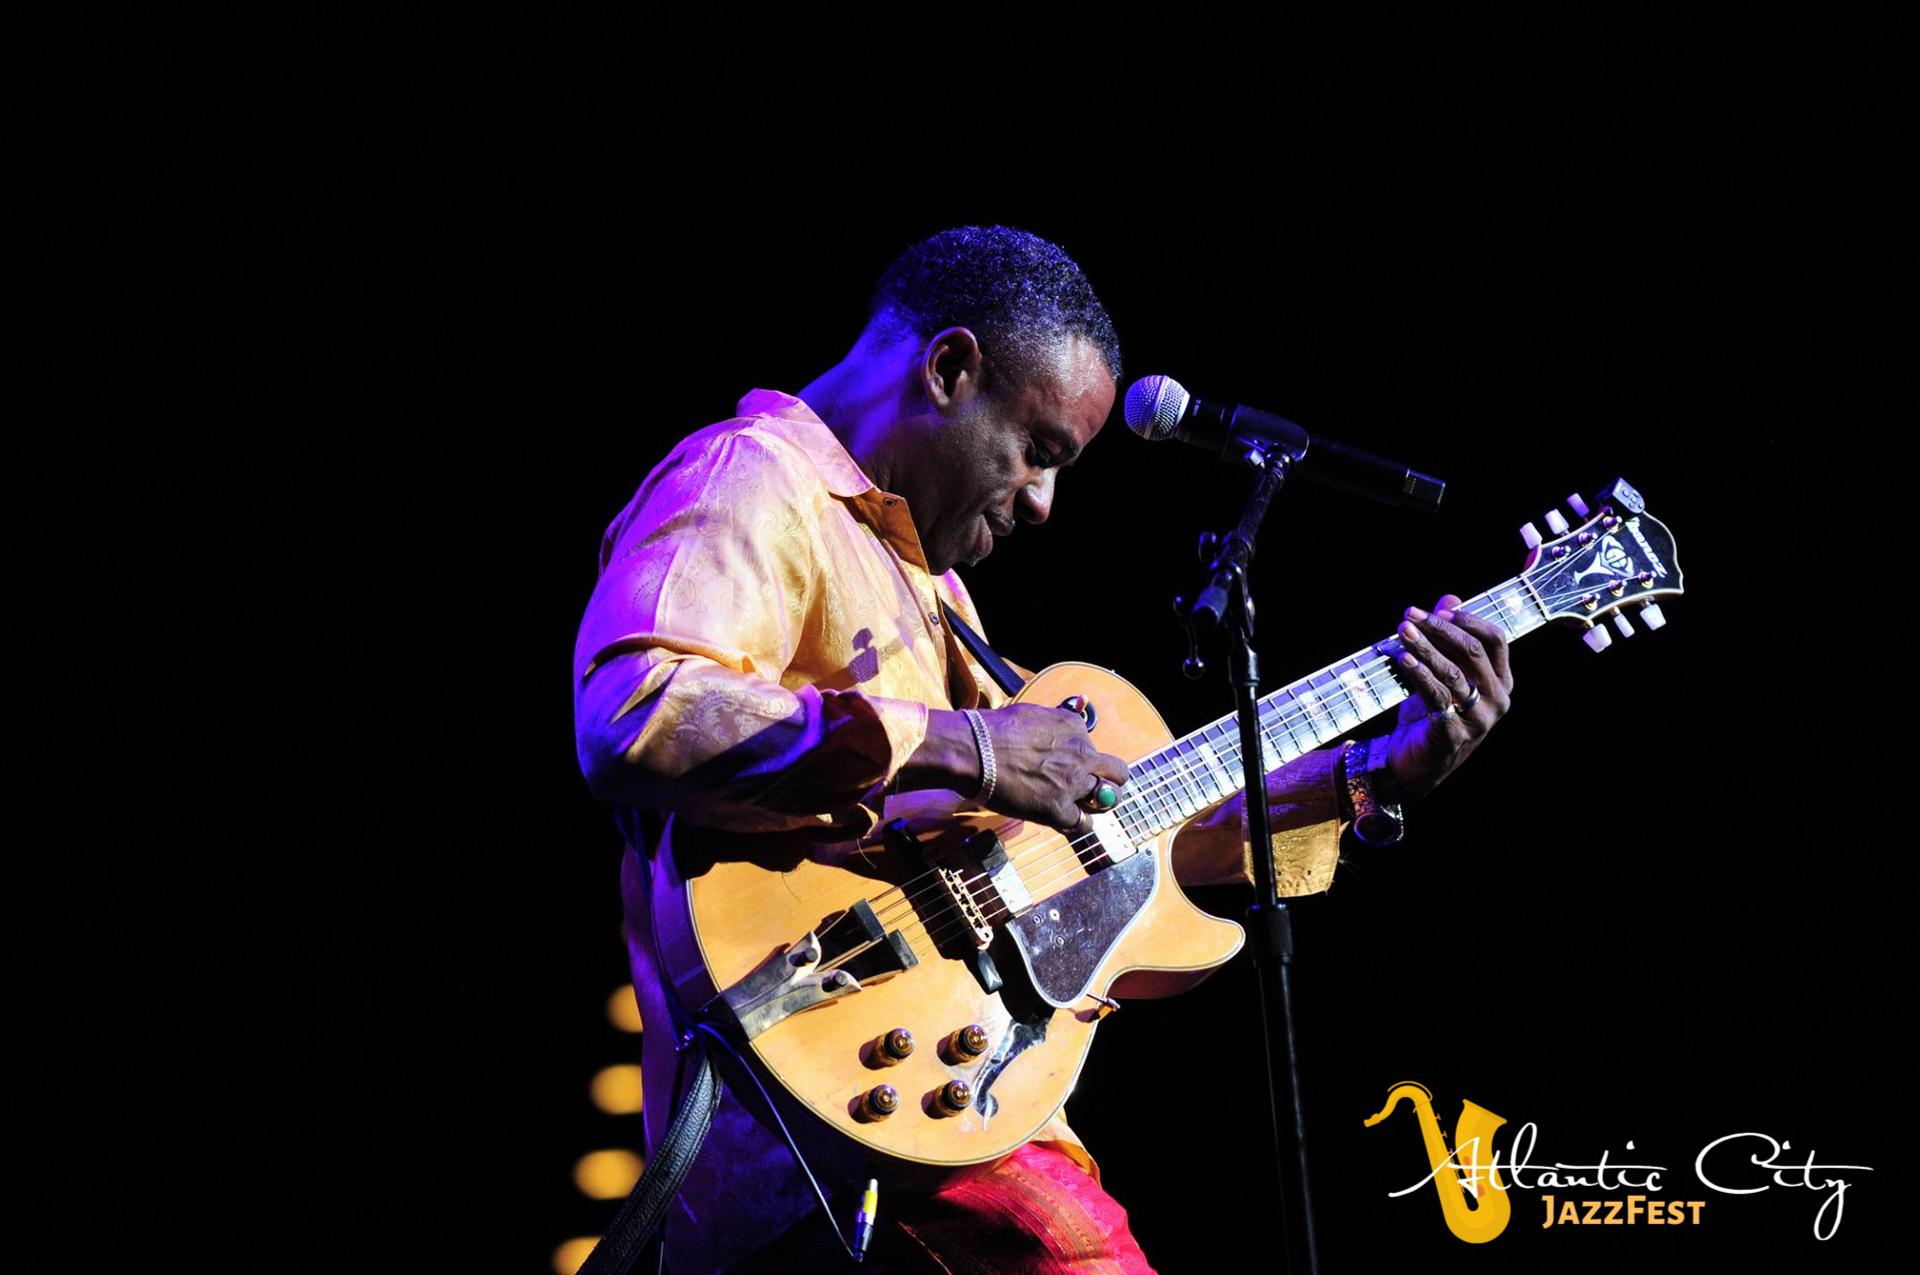 2019 Jazz Fest Picture-77